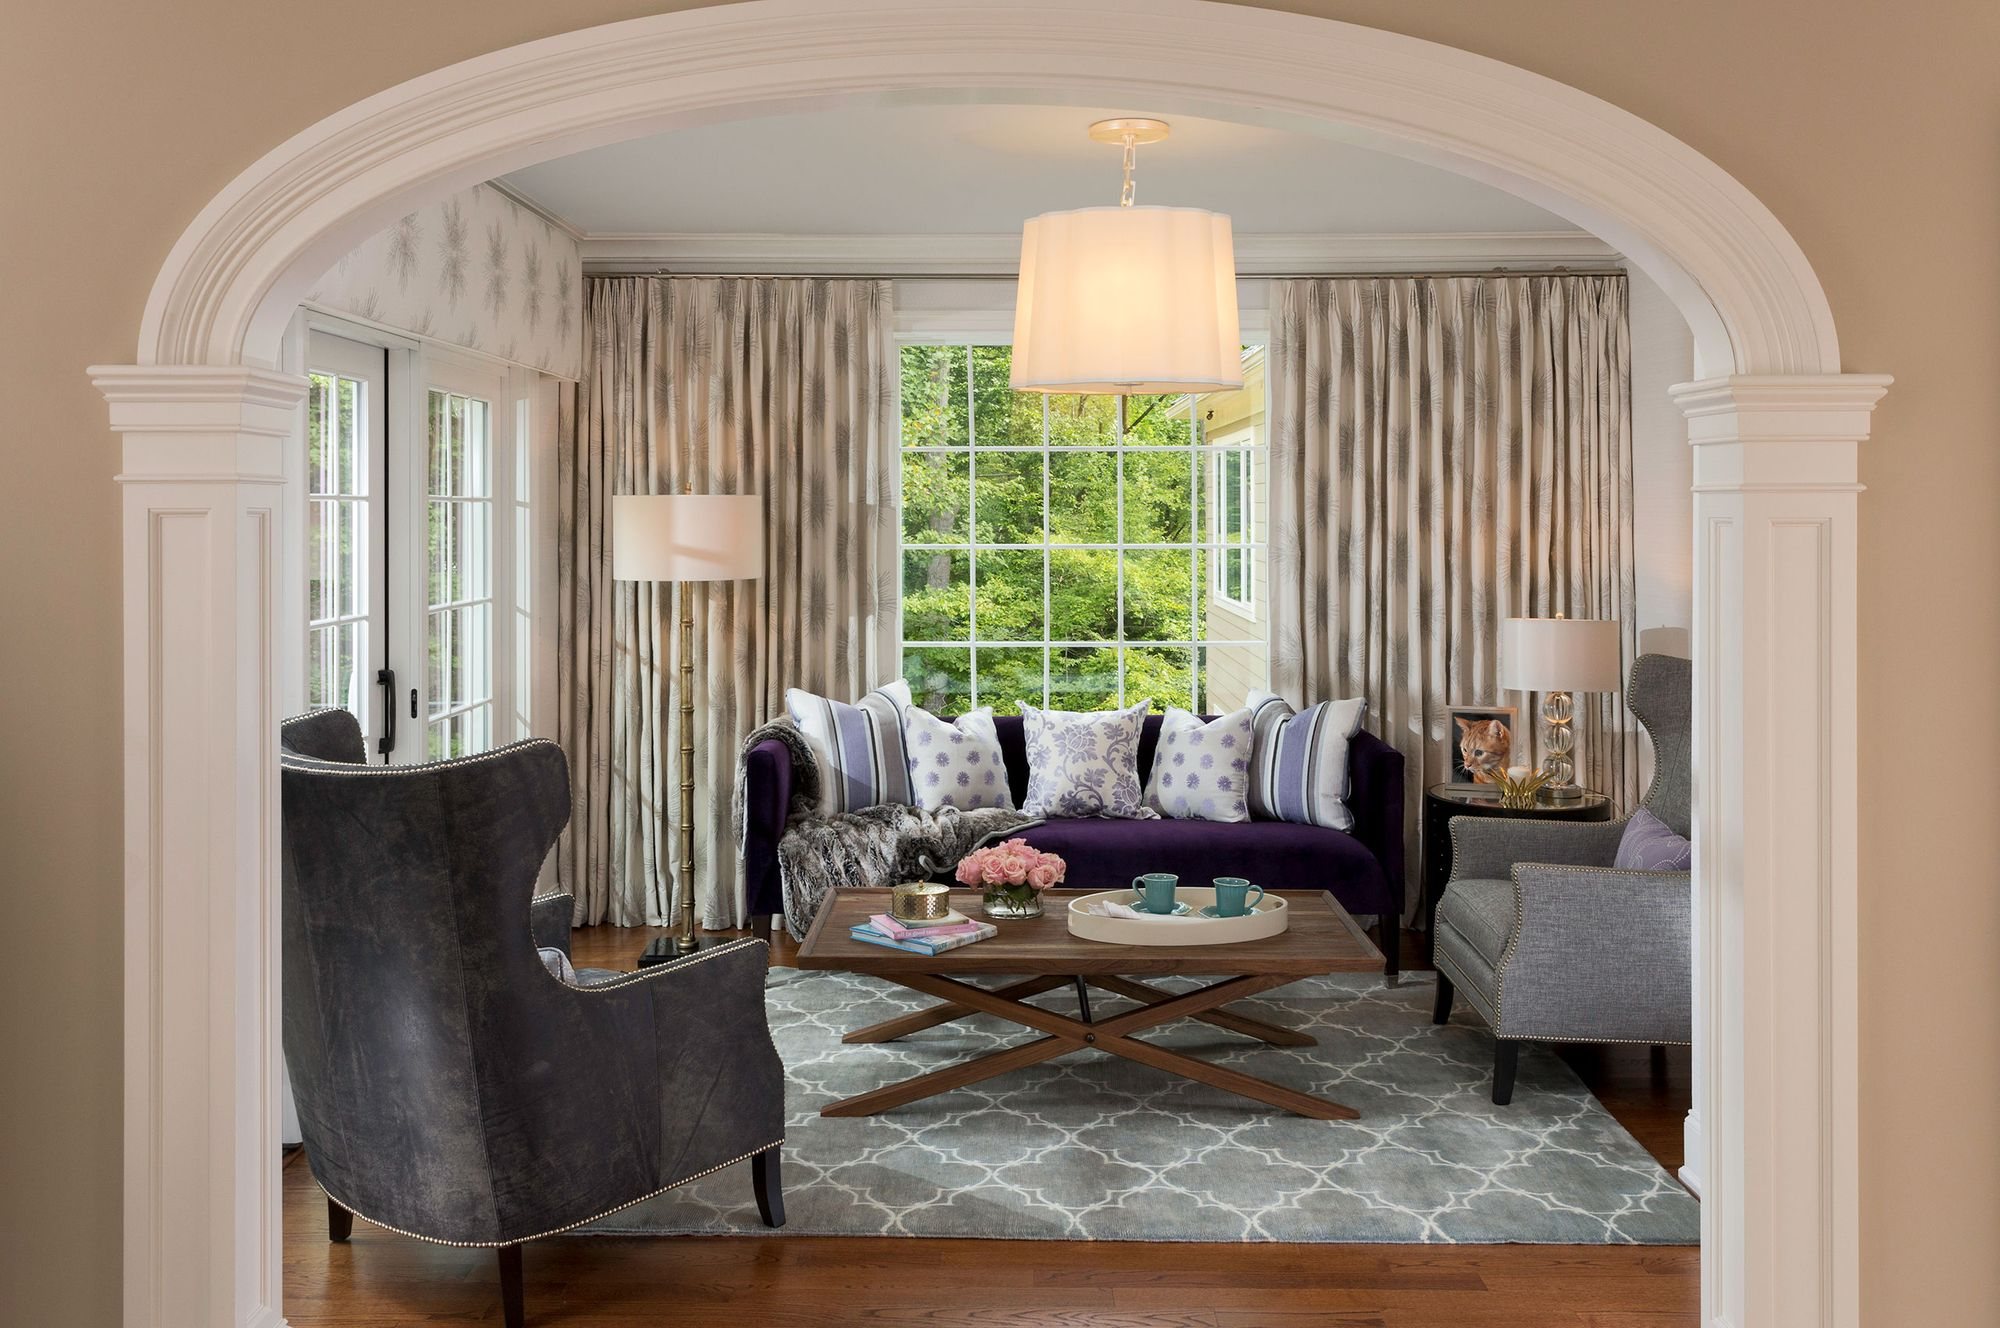 Sitting-Room-Interior-Design-Pennsylvania-Home.jpg